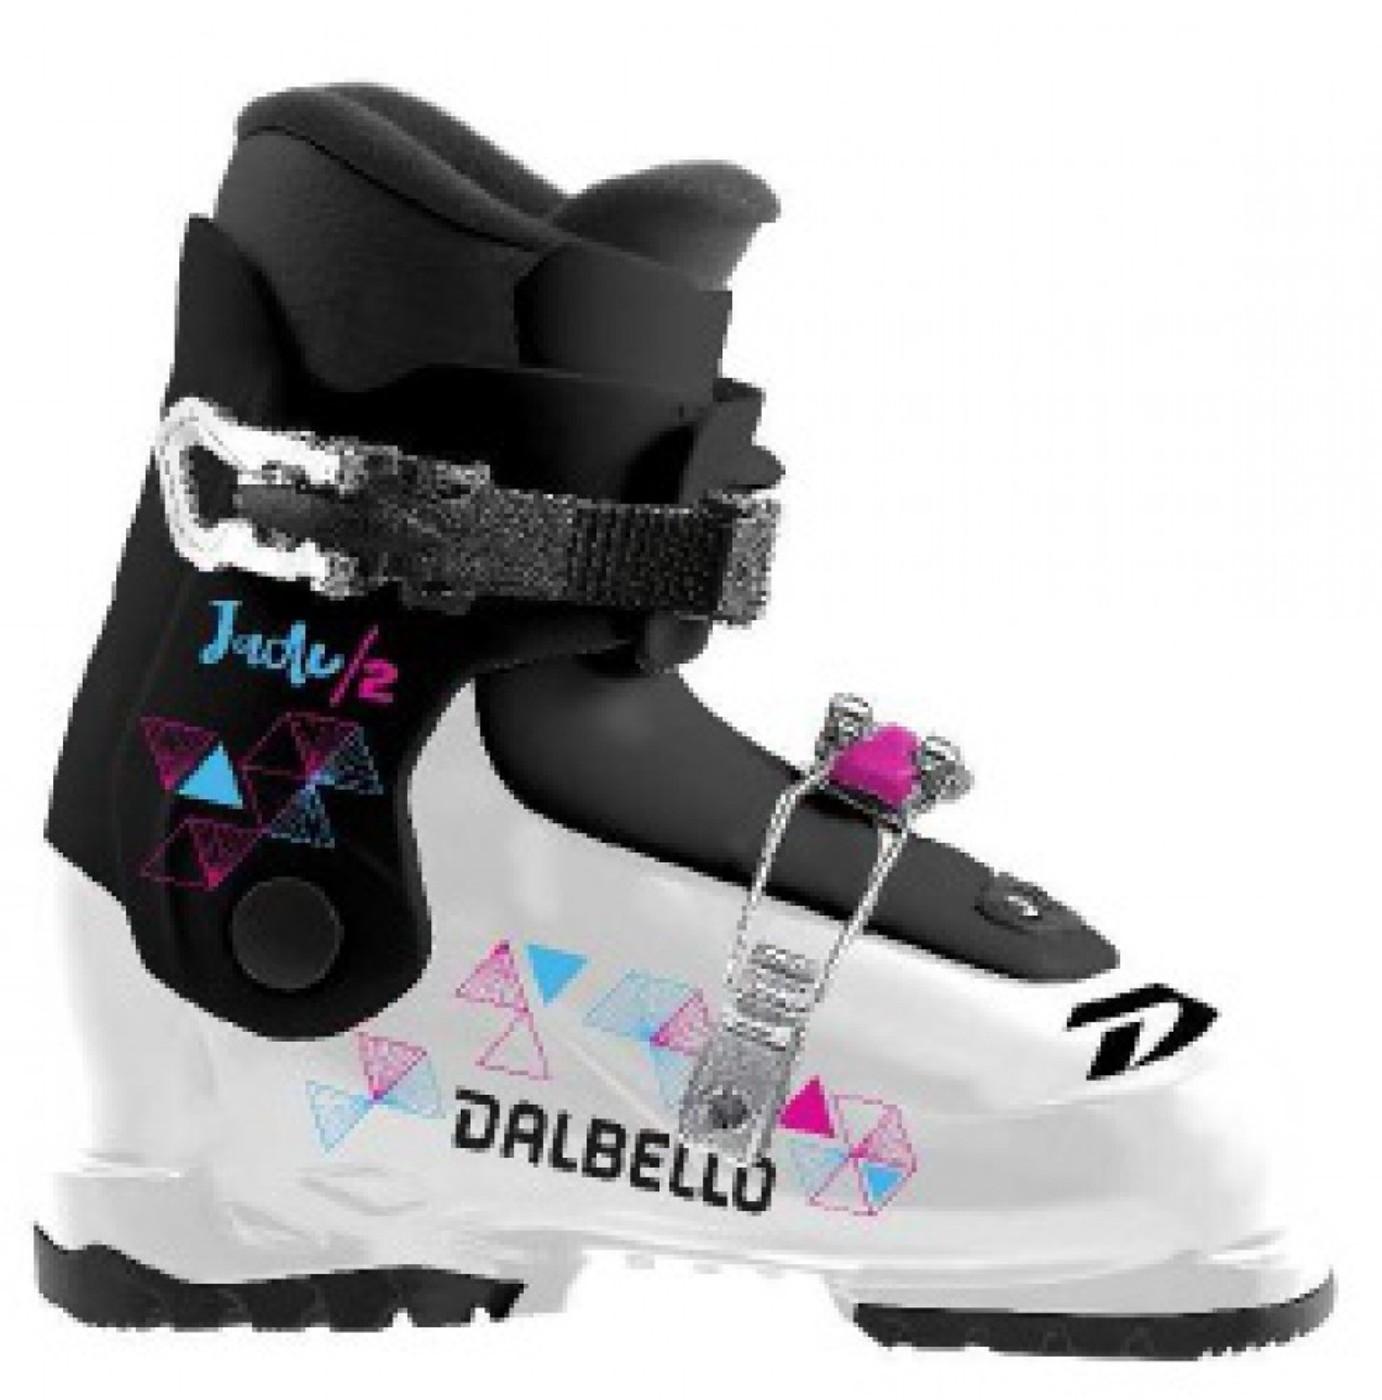 DALBELLO JADE 2.0 - Kinder